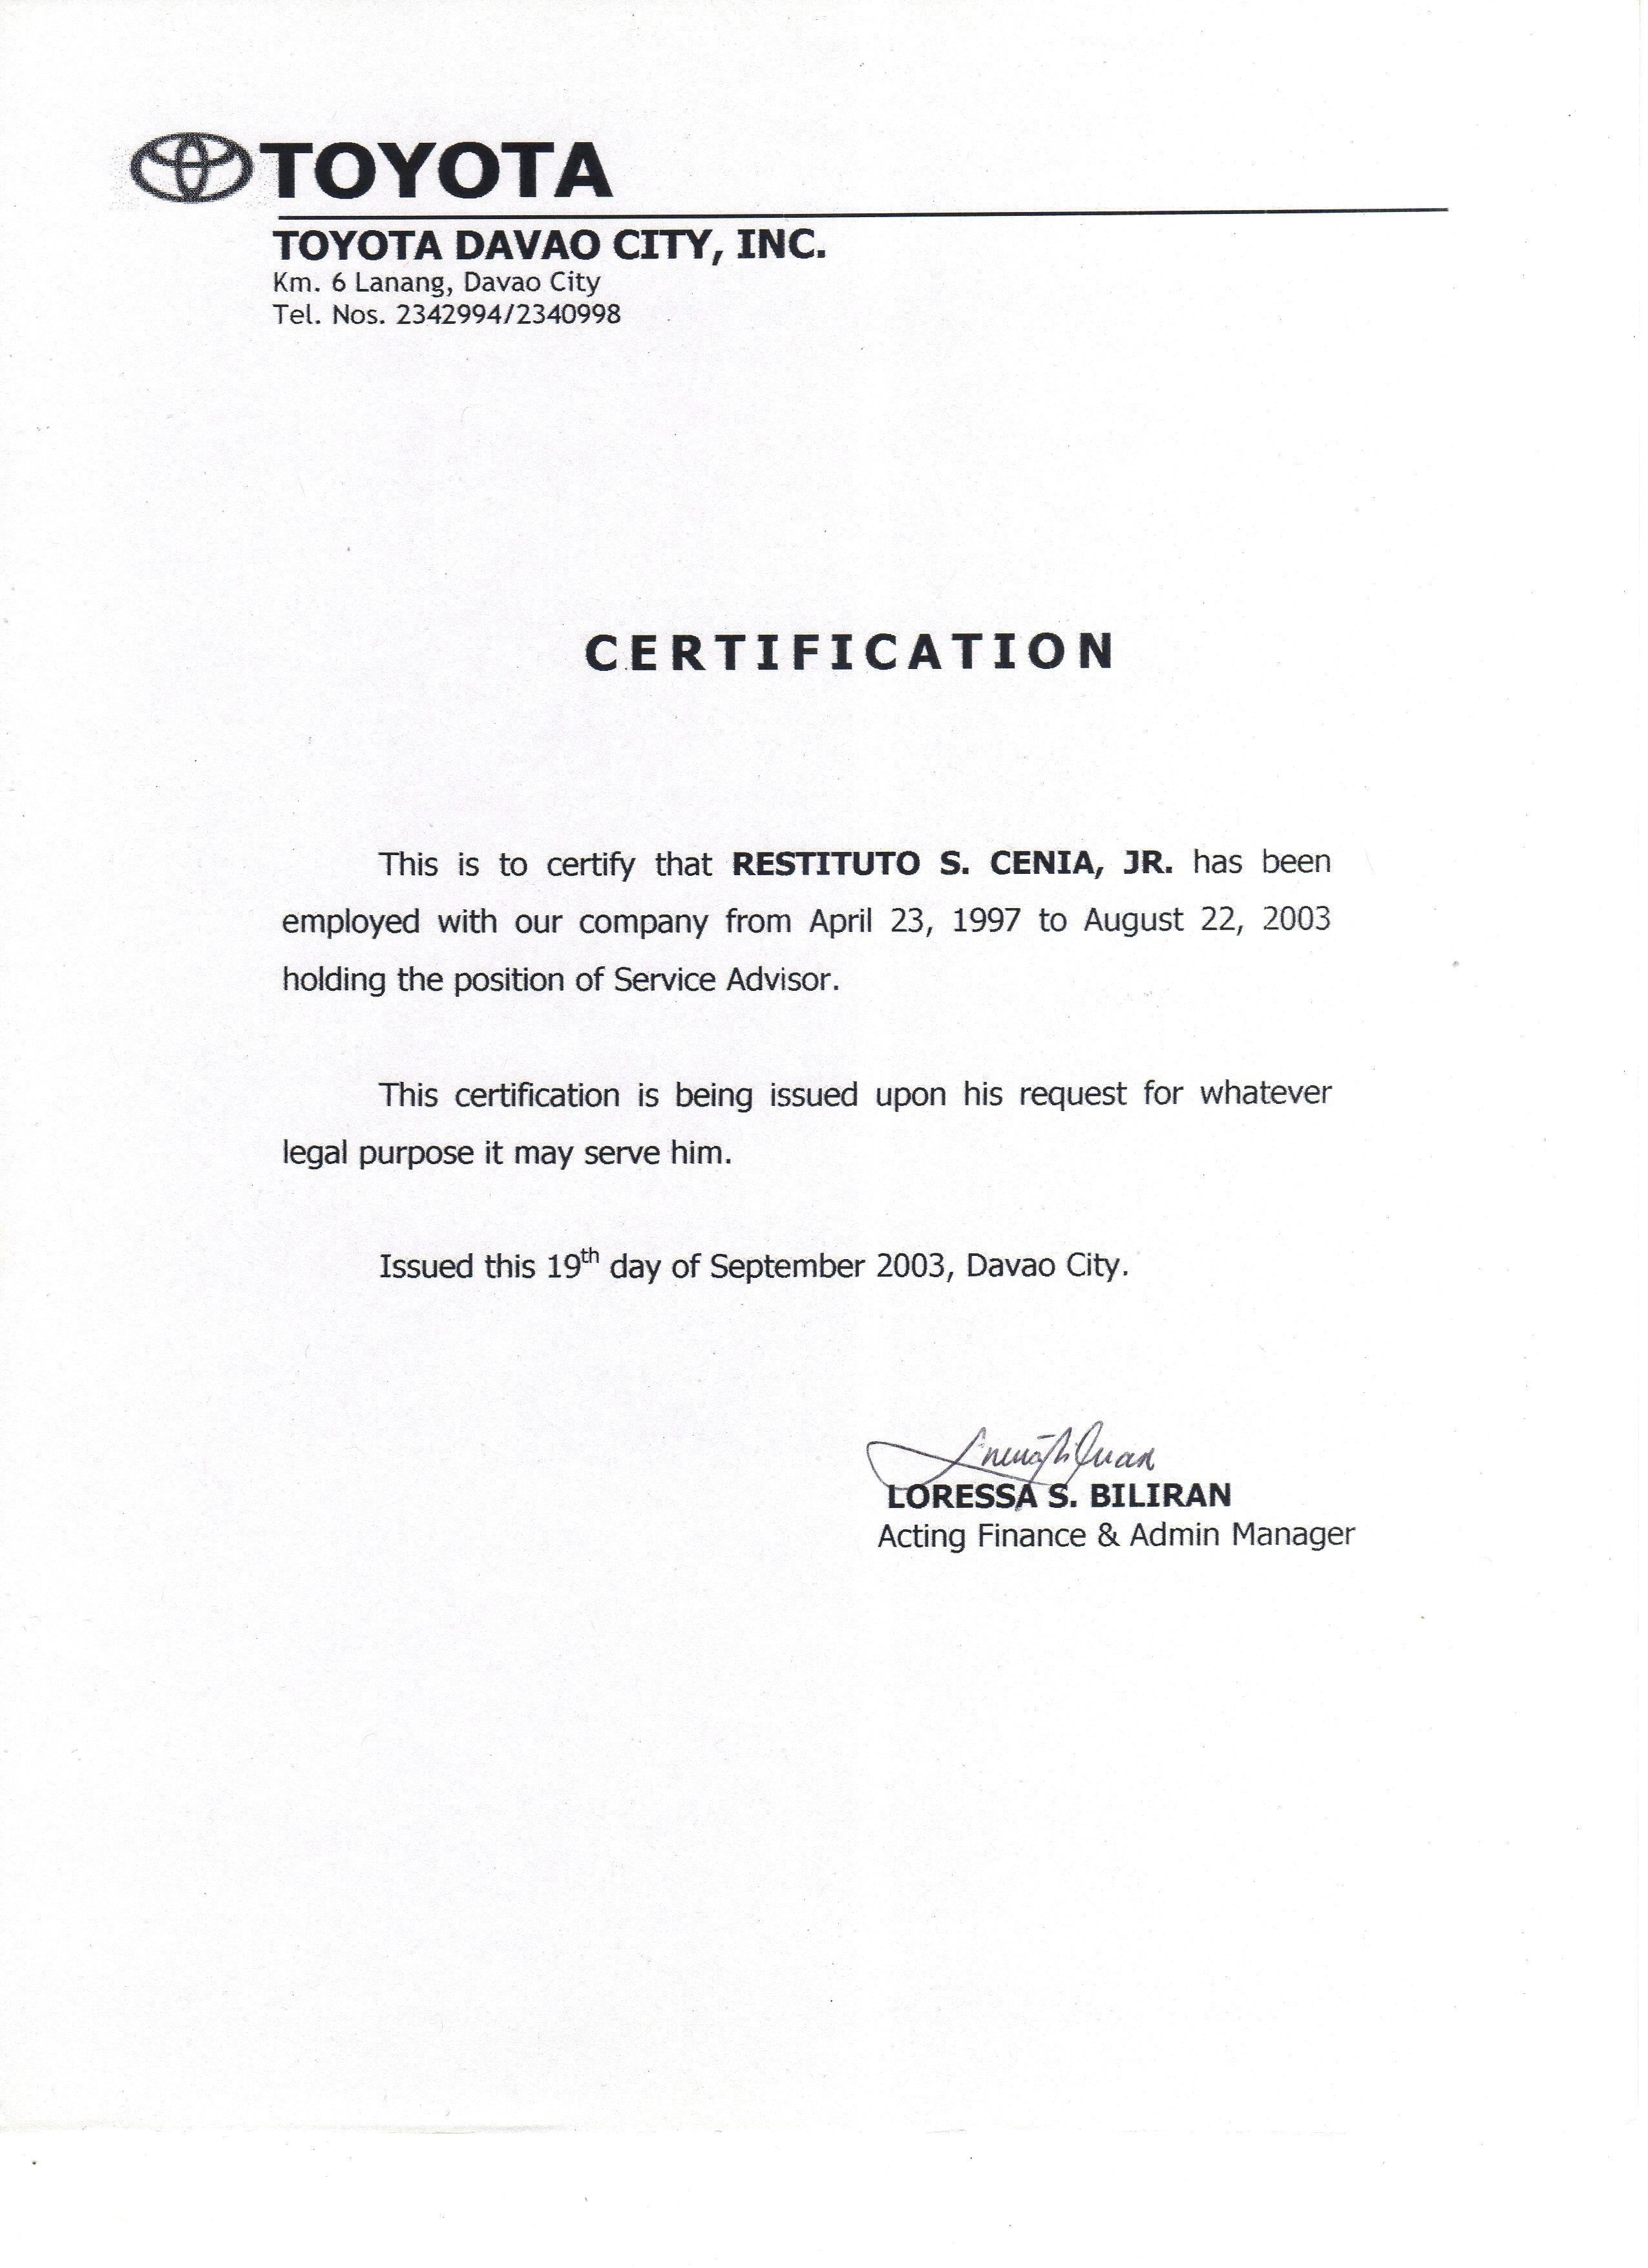 Employment Verification Letter Template Word Employment